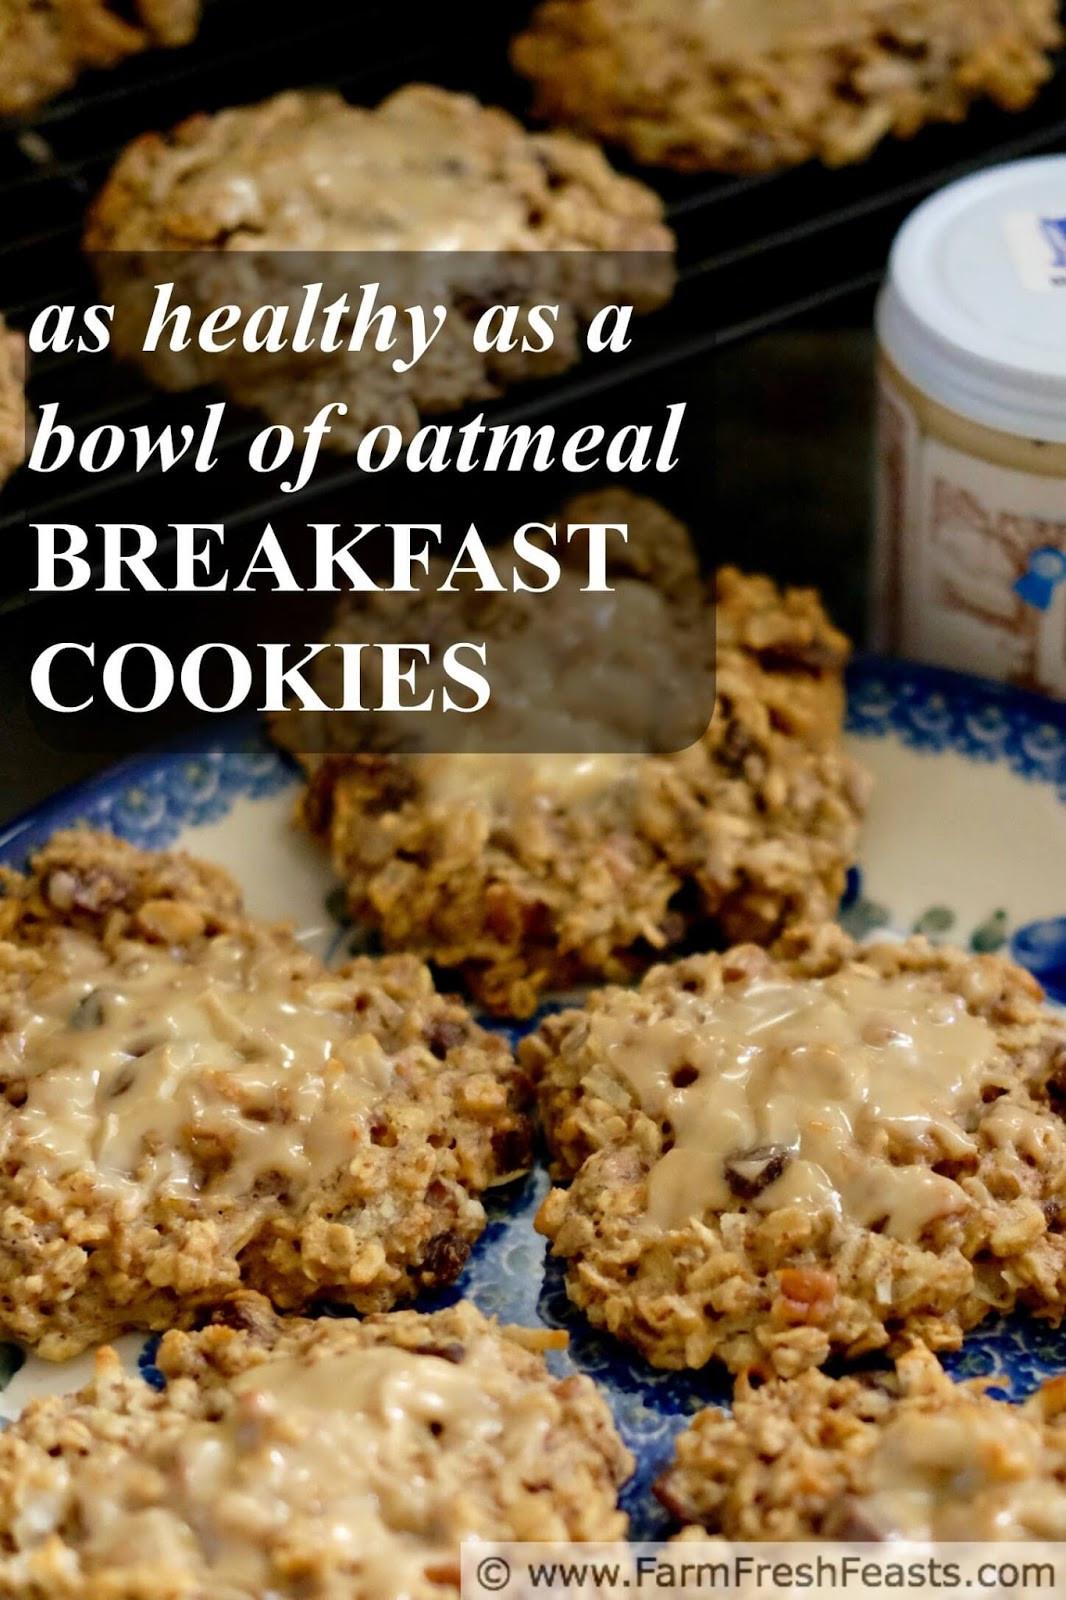 Healthy Breakfast Cookie  Farm Fresh Feasts Healthy Breakfast Cookies